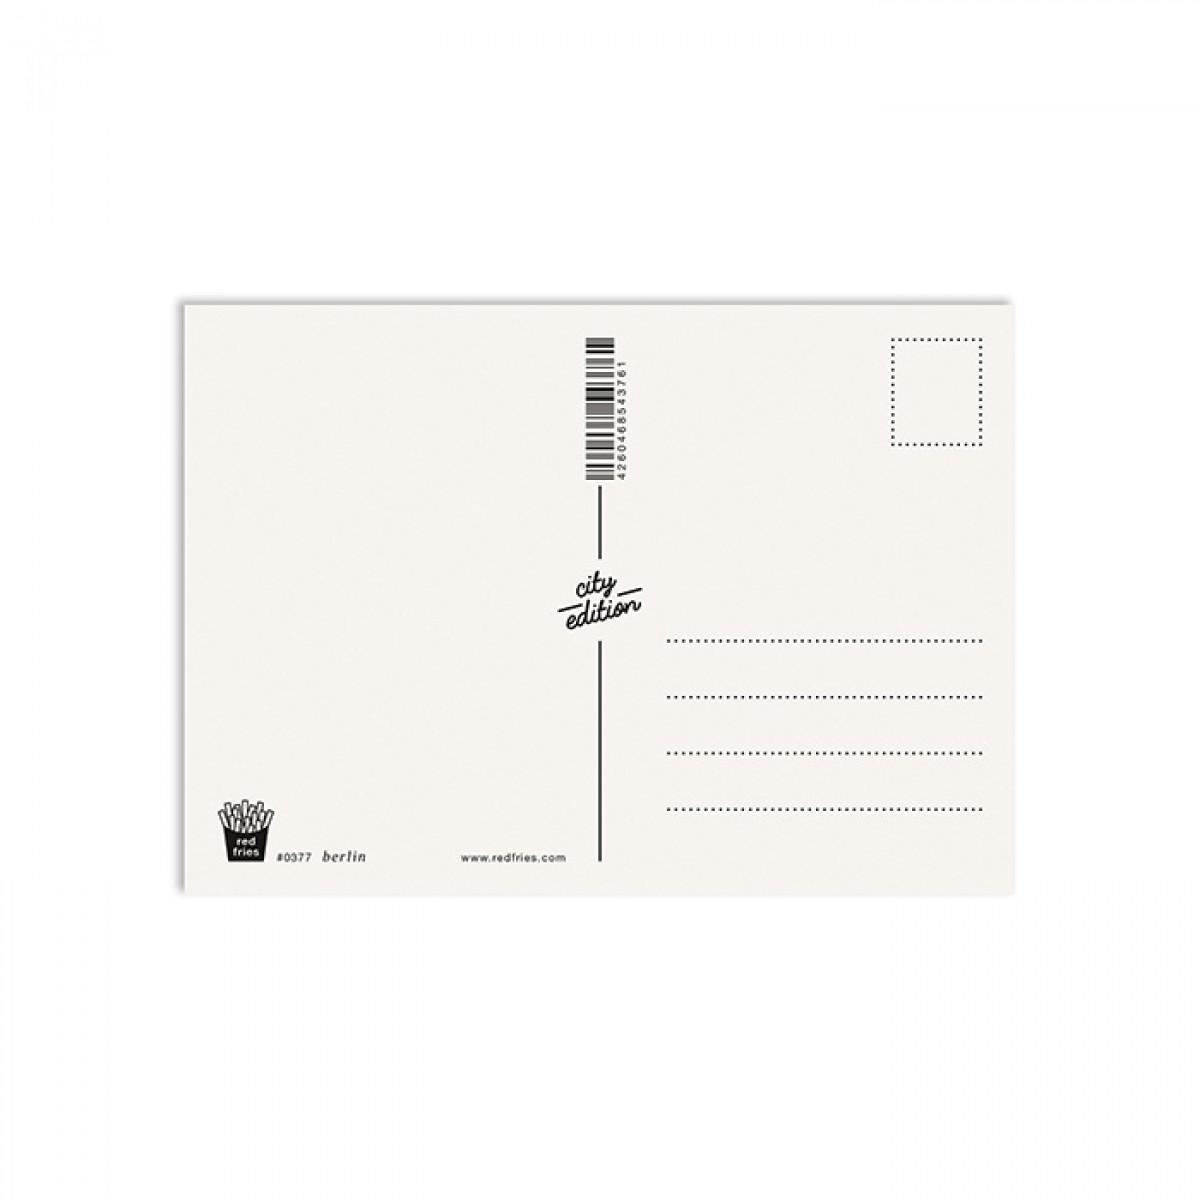 redfries berlin – Postkarte DIN A6